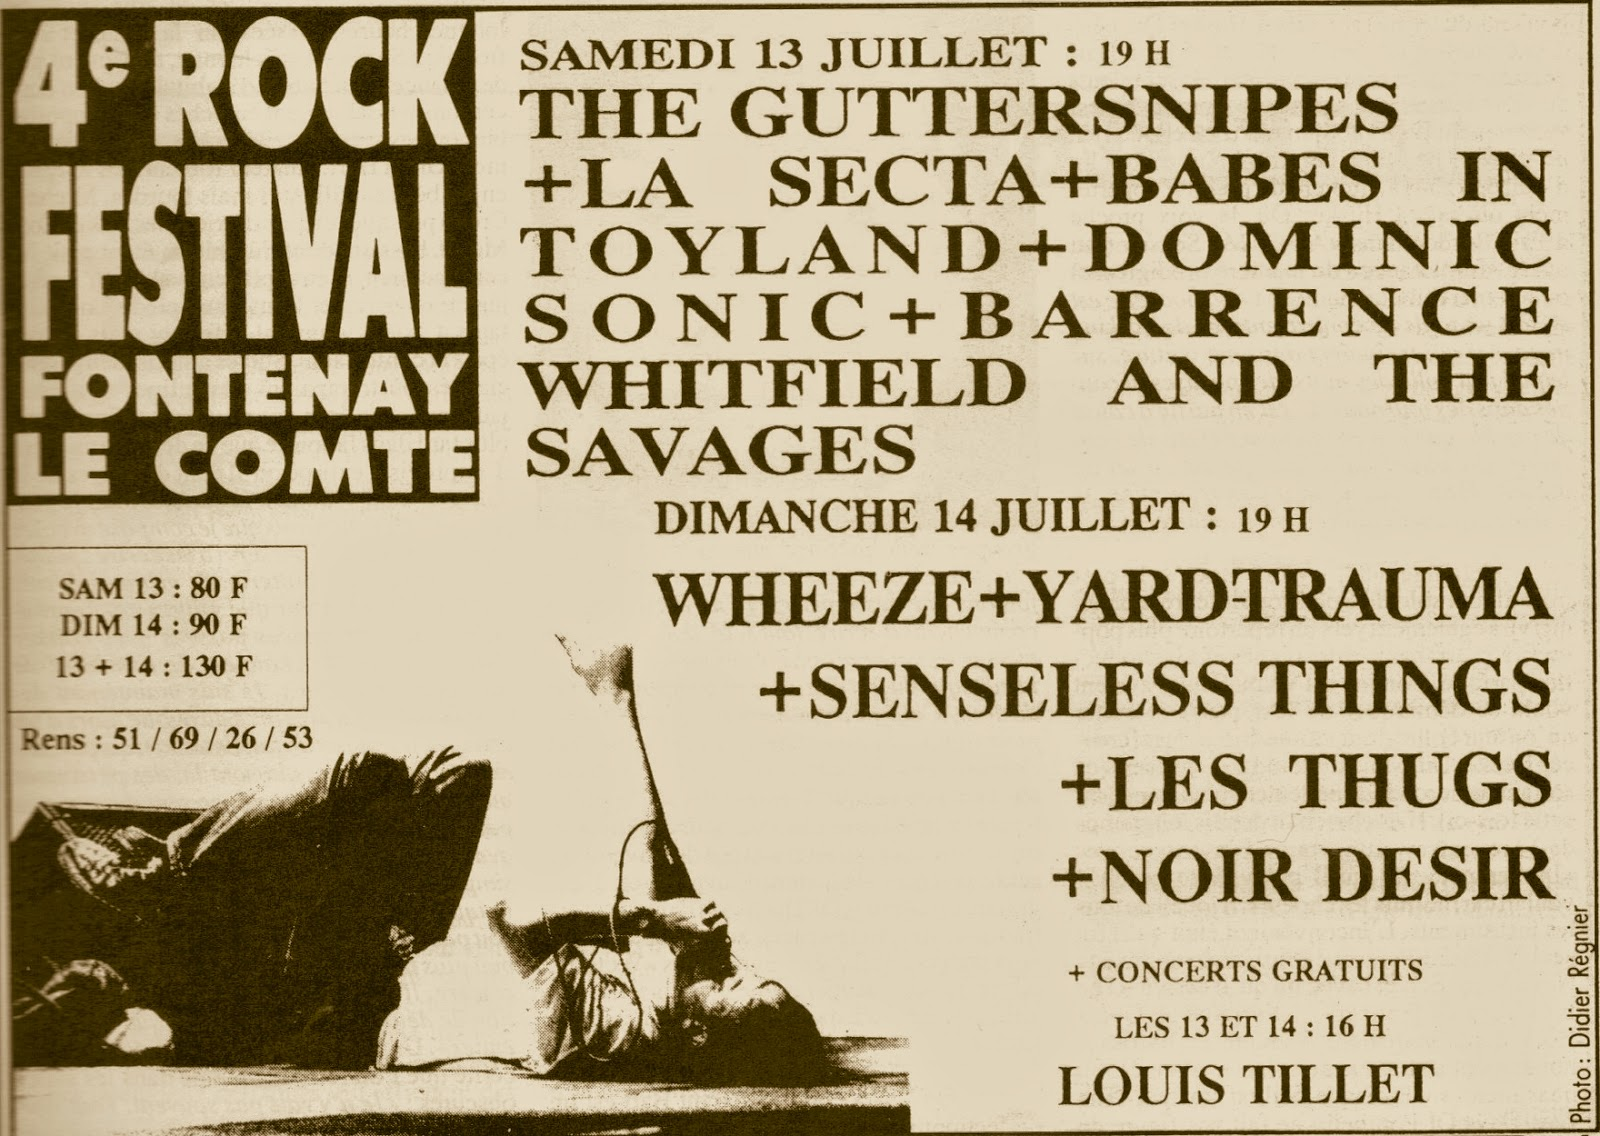 les thugs concerts pub 14 juillet 1991 festival fontenay le comte. Black Bedroom Furniture Sets. Home Design Ideas